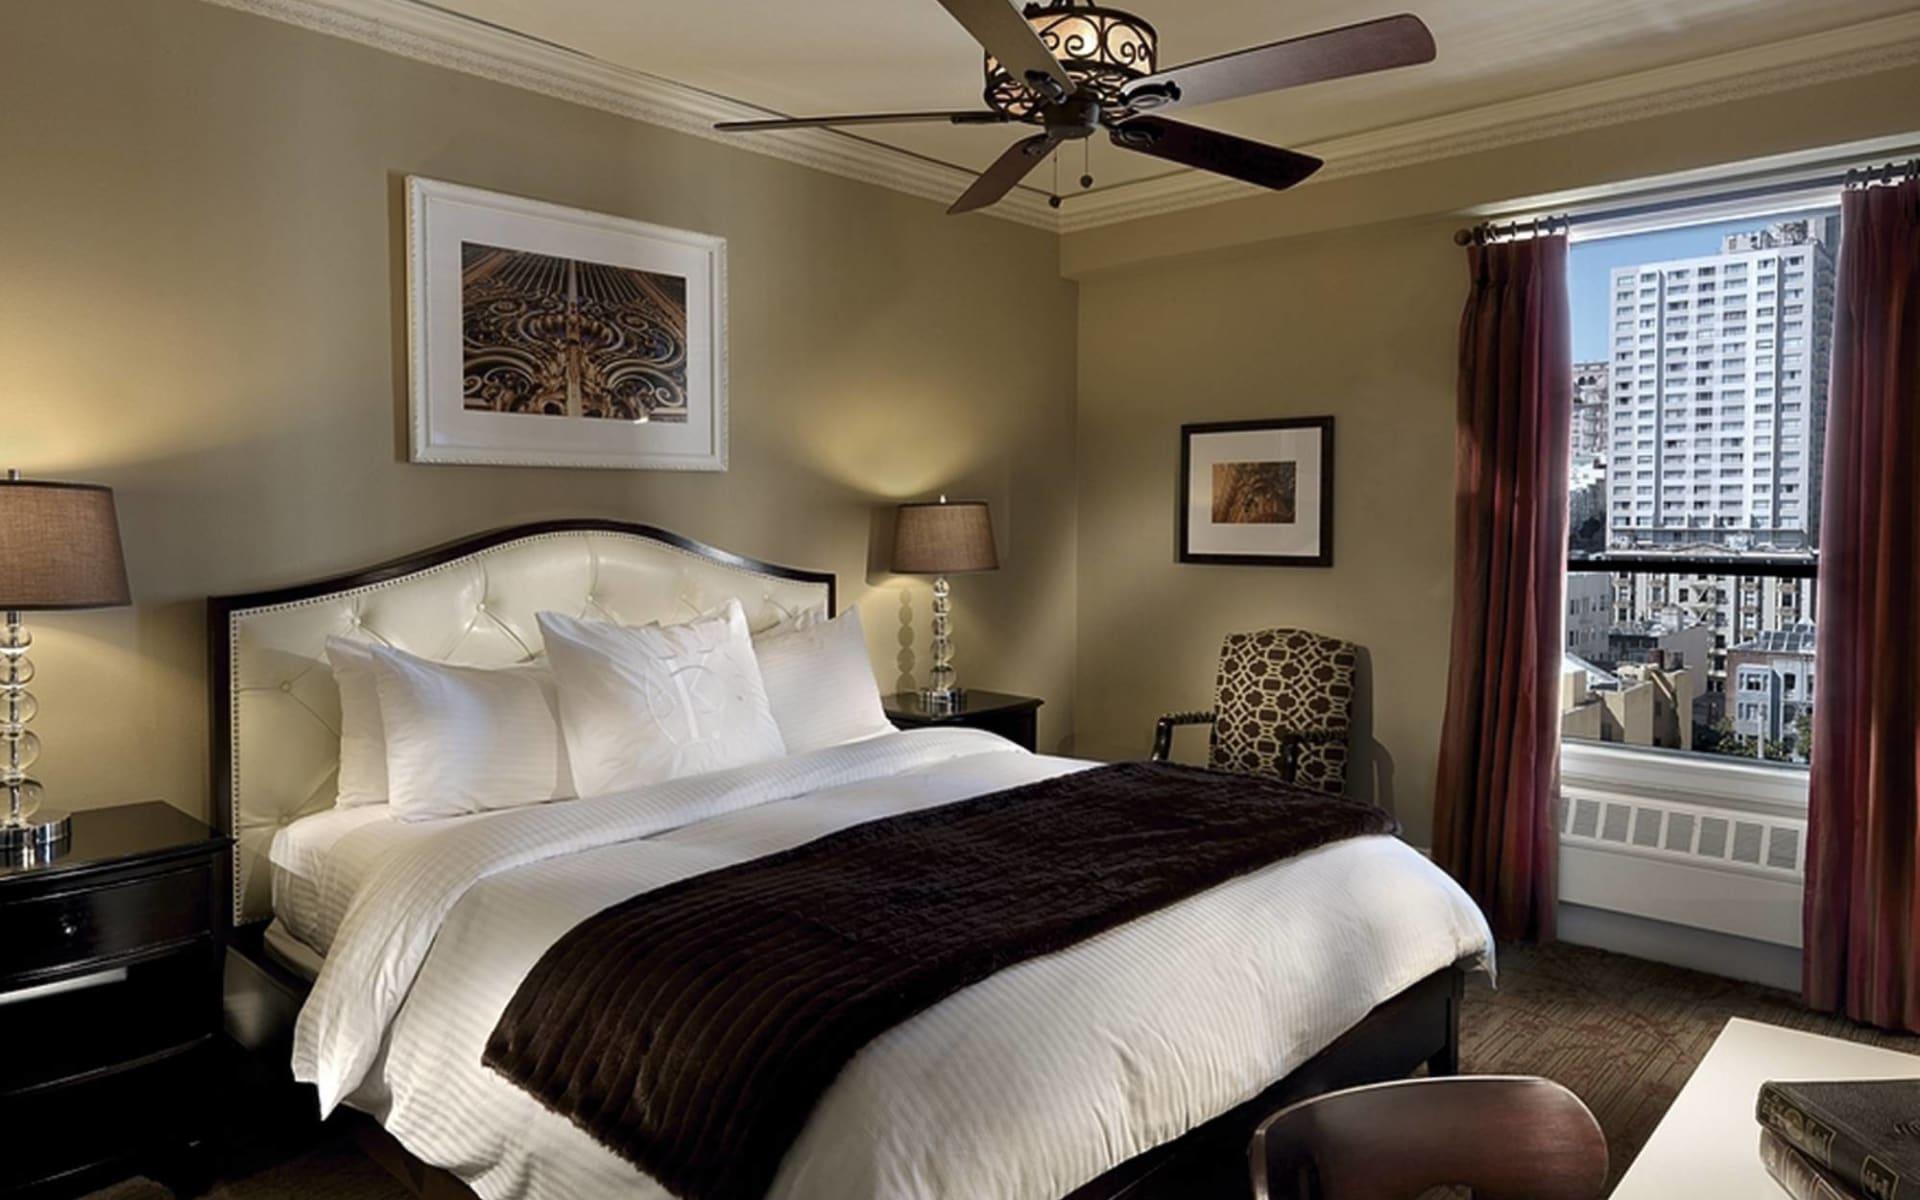 Kensington Park in San Francisco: zimmer kensington park hotel doppelzimmer